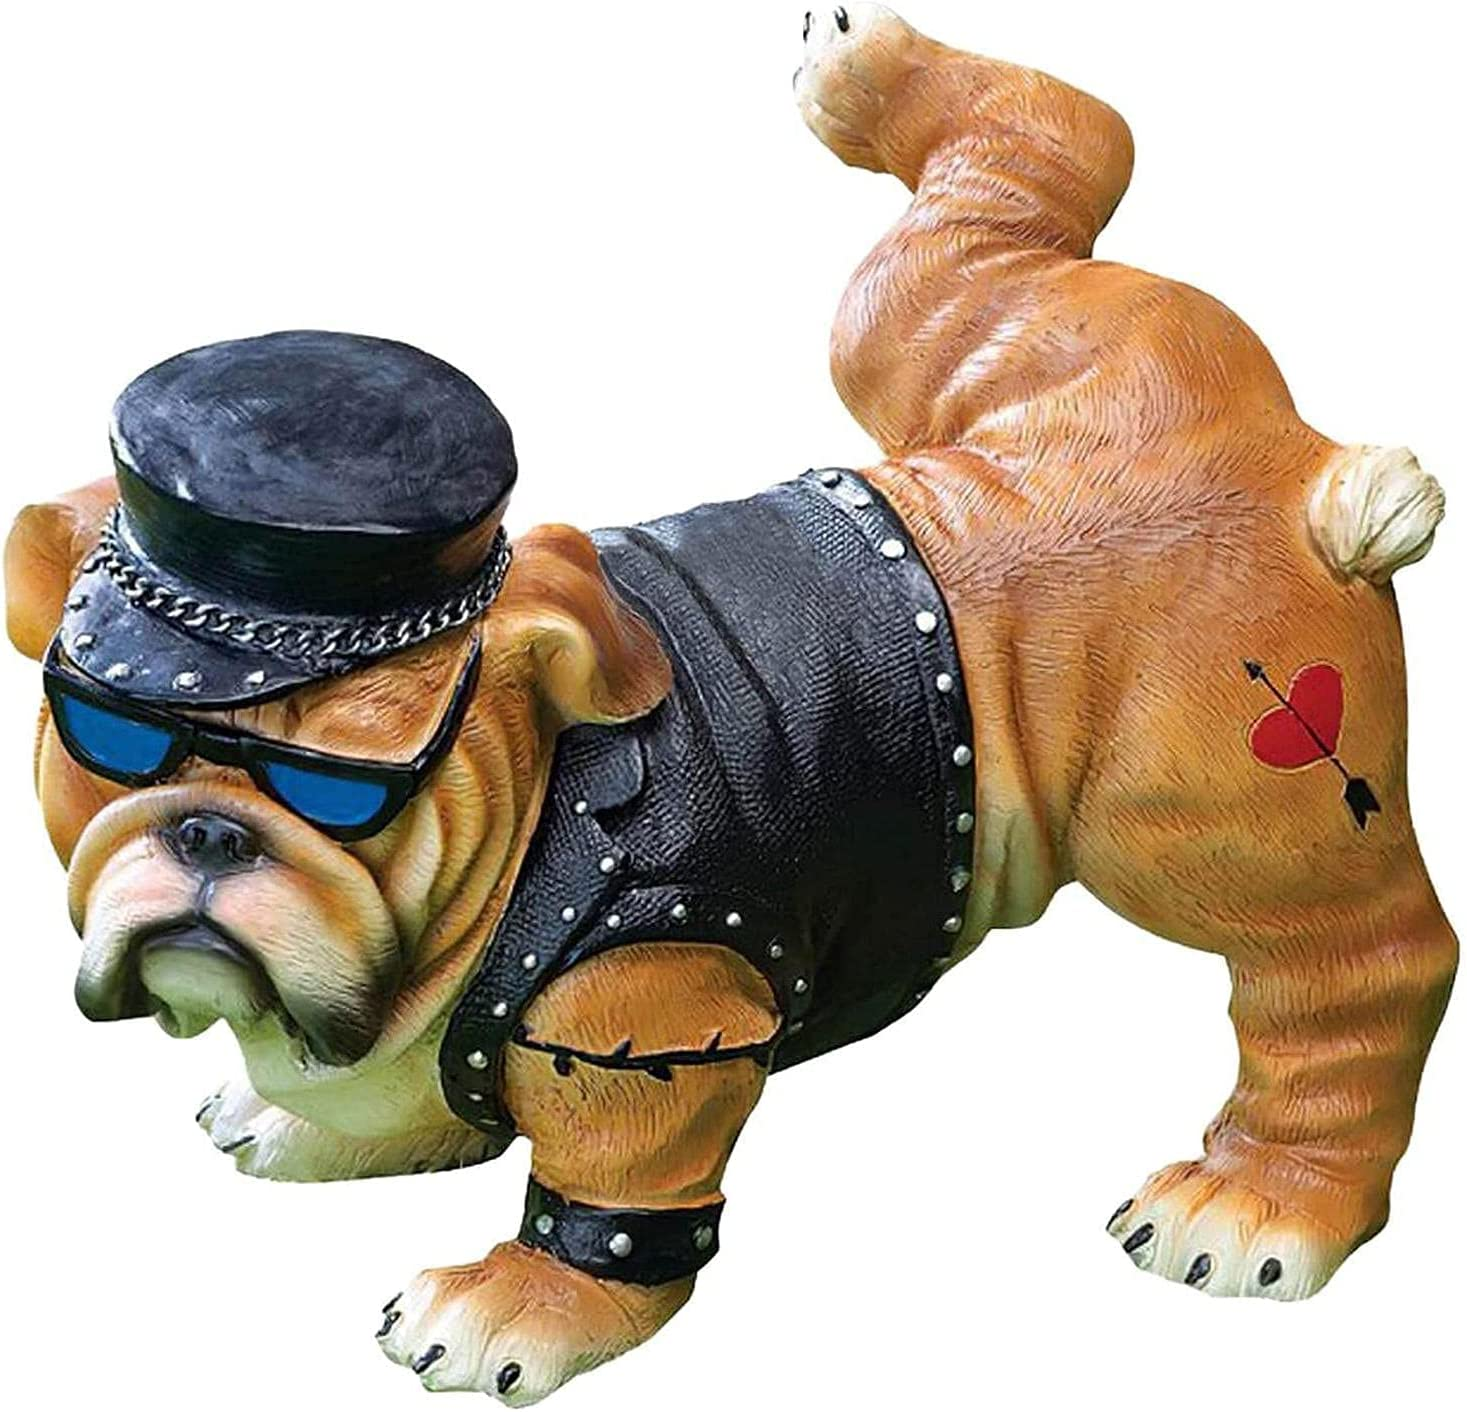 badewanne Peeing Dog Statue Bulldog Philadelphia Mall Max 52% OFF Ornaments Creative Figurines